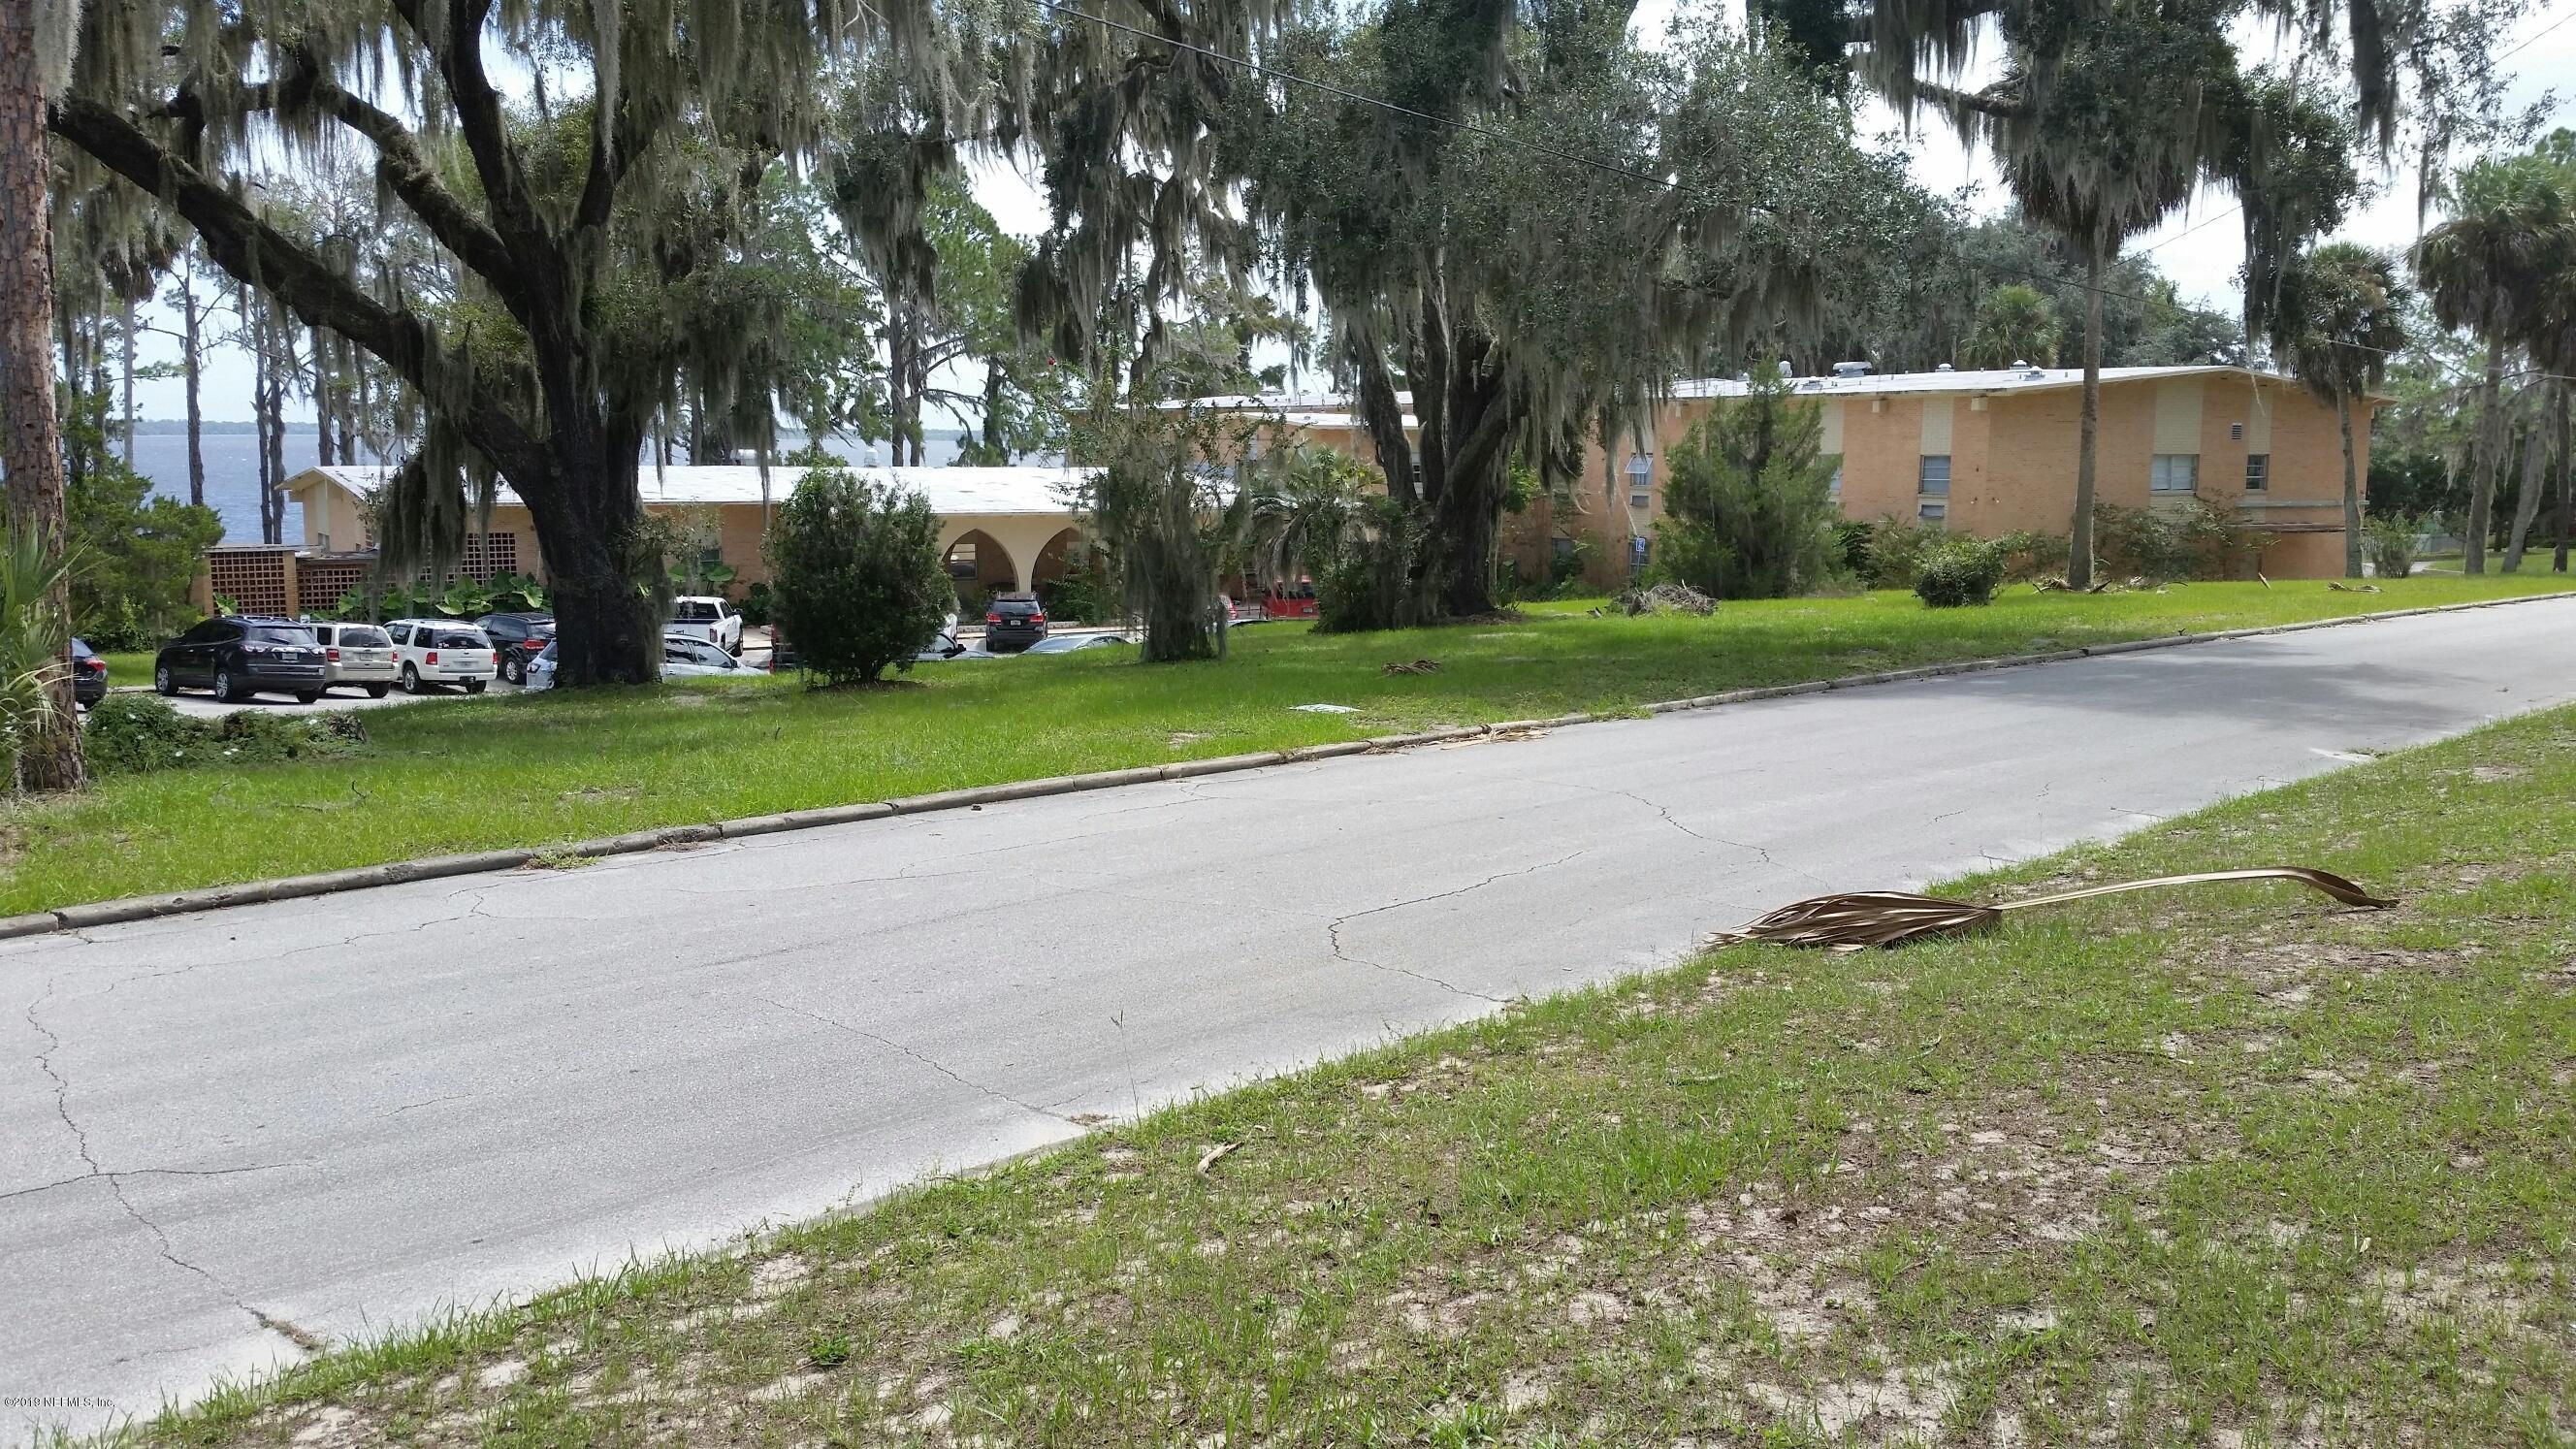 101 EUCALYPTUS- CRESCENT CITY- FLORIDA 32112, ,Commercial,For sale,EUCALYPTUS,1016488